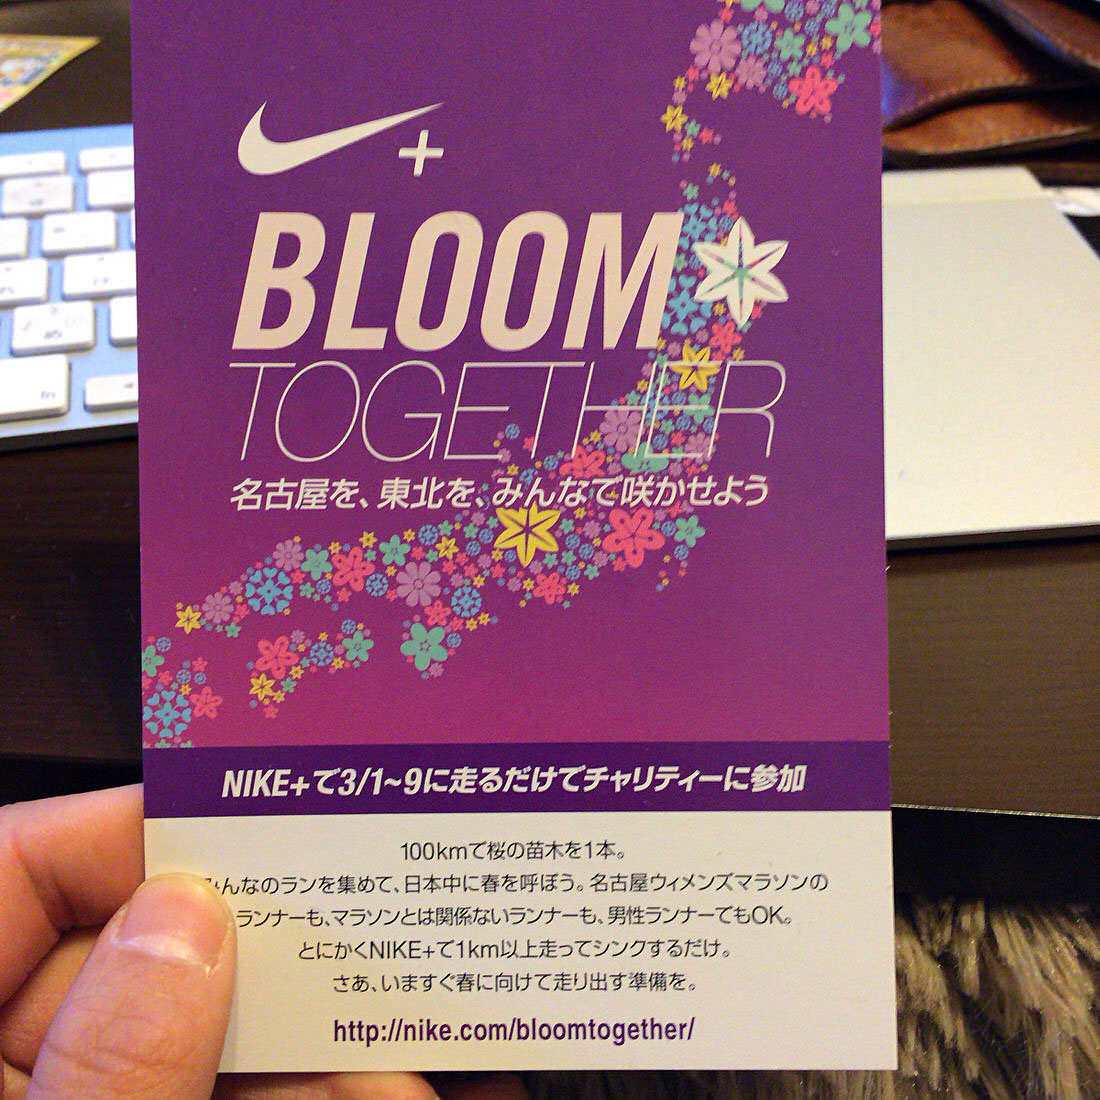 nike-bloom